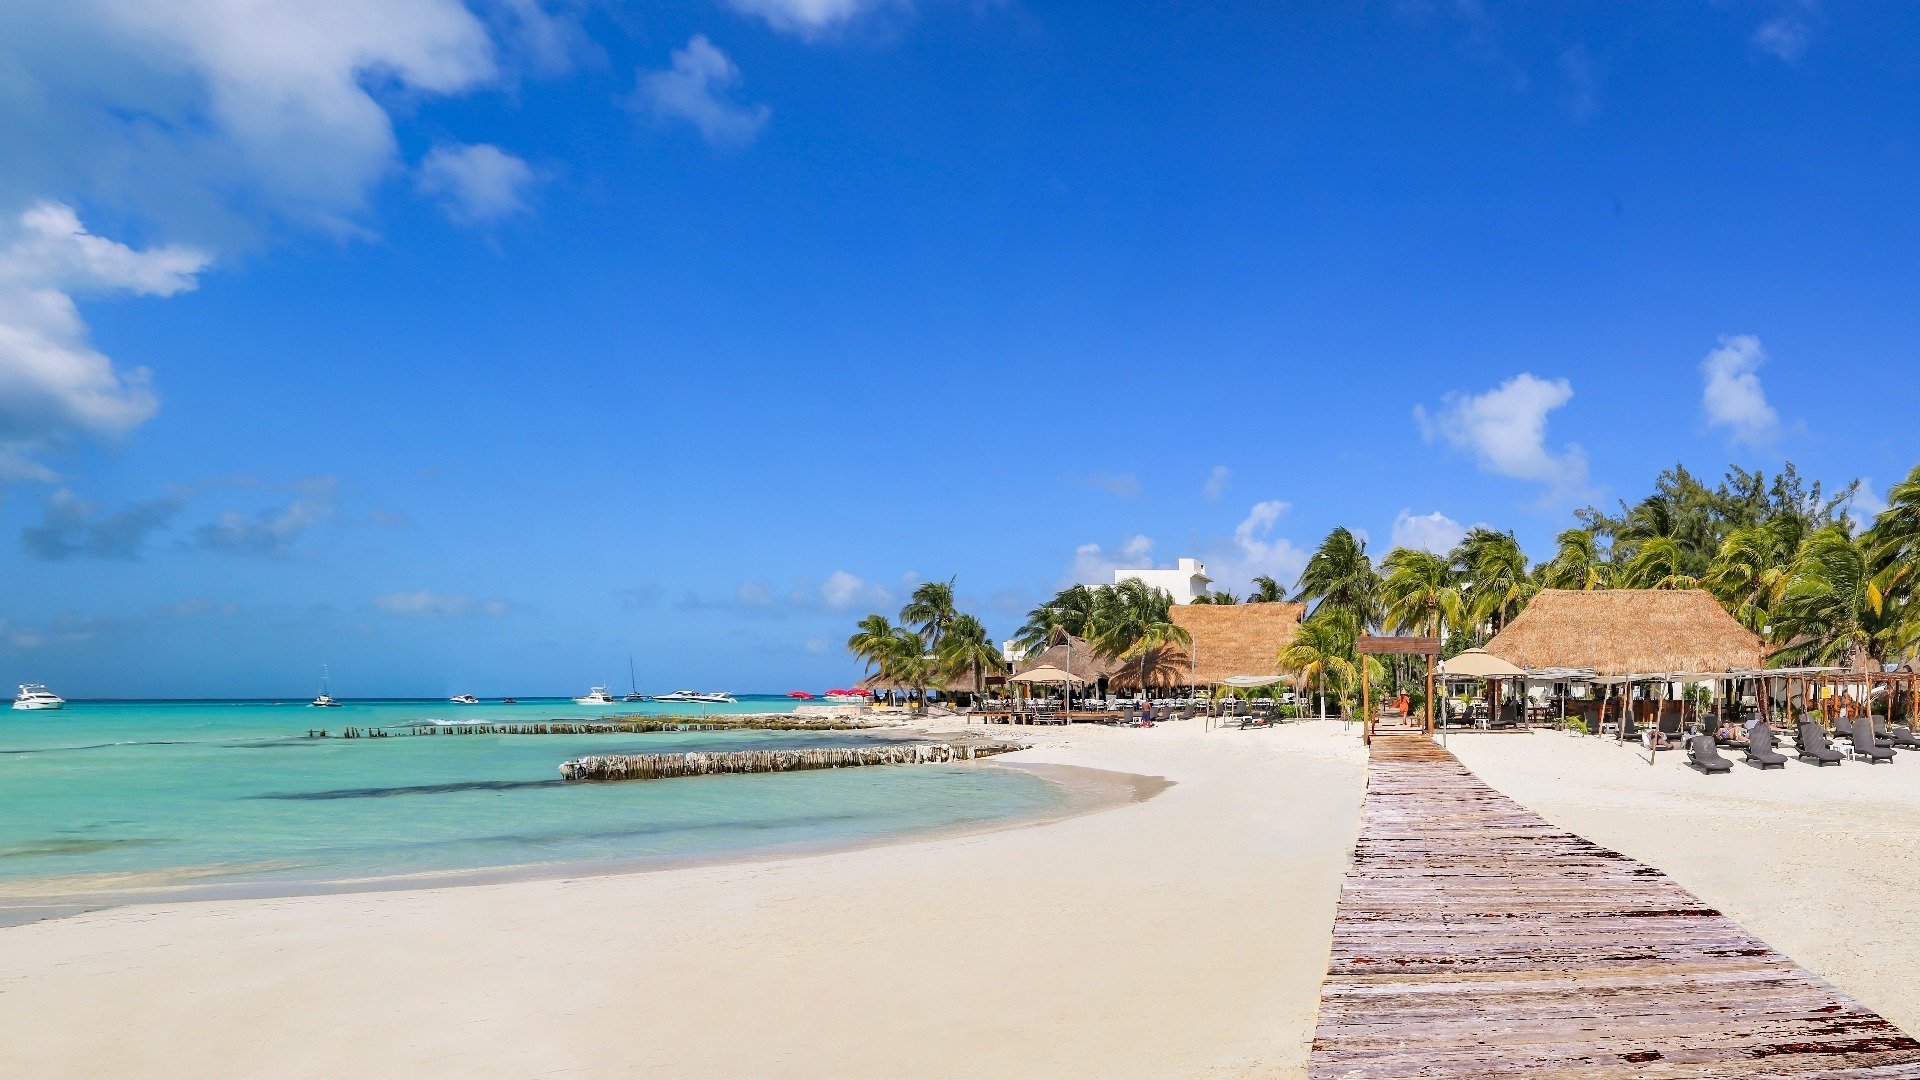 01 - Lowres - Club de playa Punta Blanca - Isla Mujeres